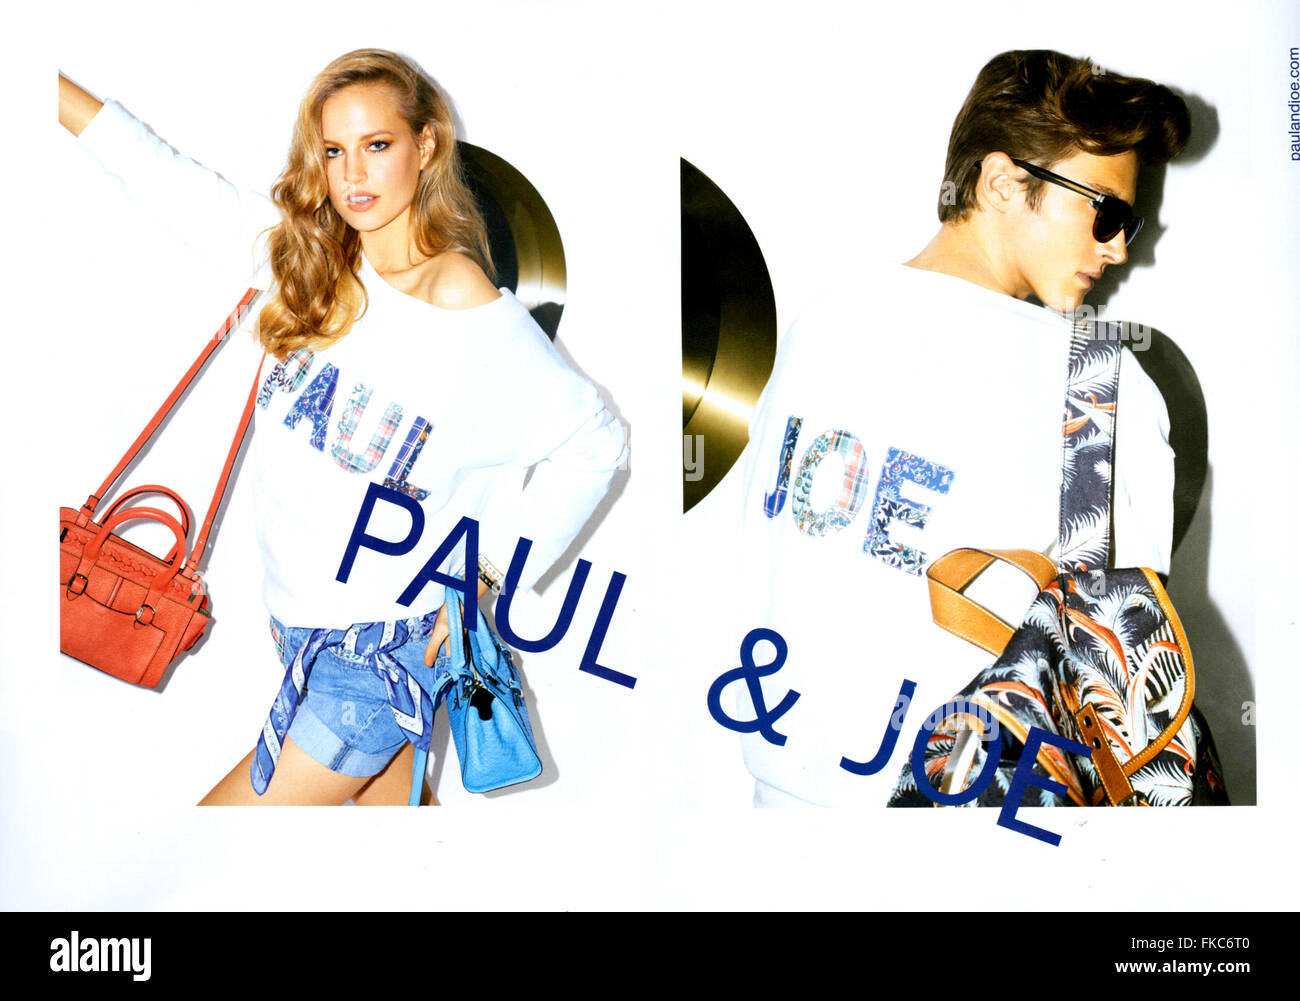 2010s UK Paul & Joe Magazine Advert - Stock Image